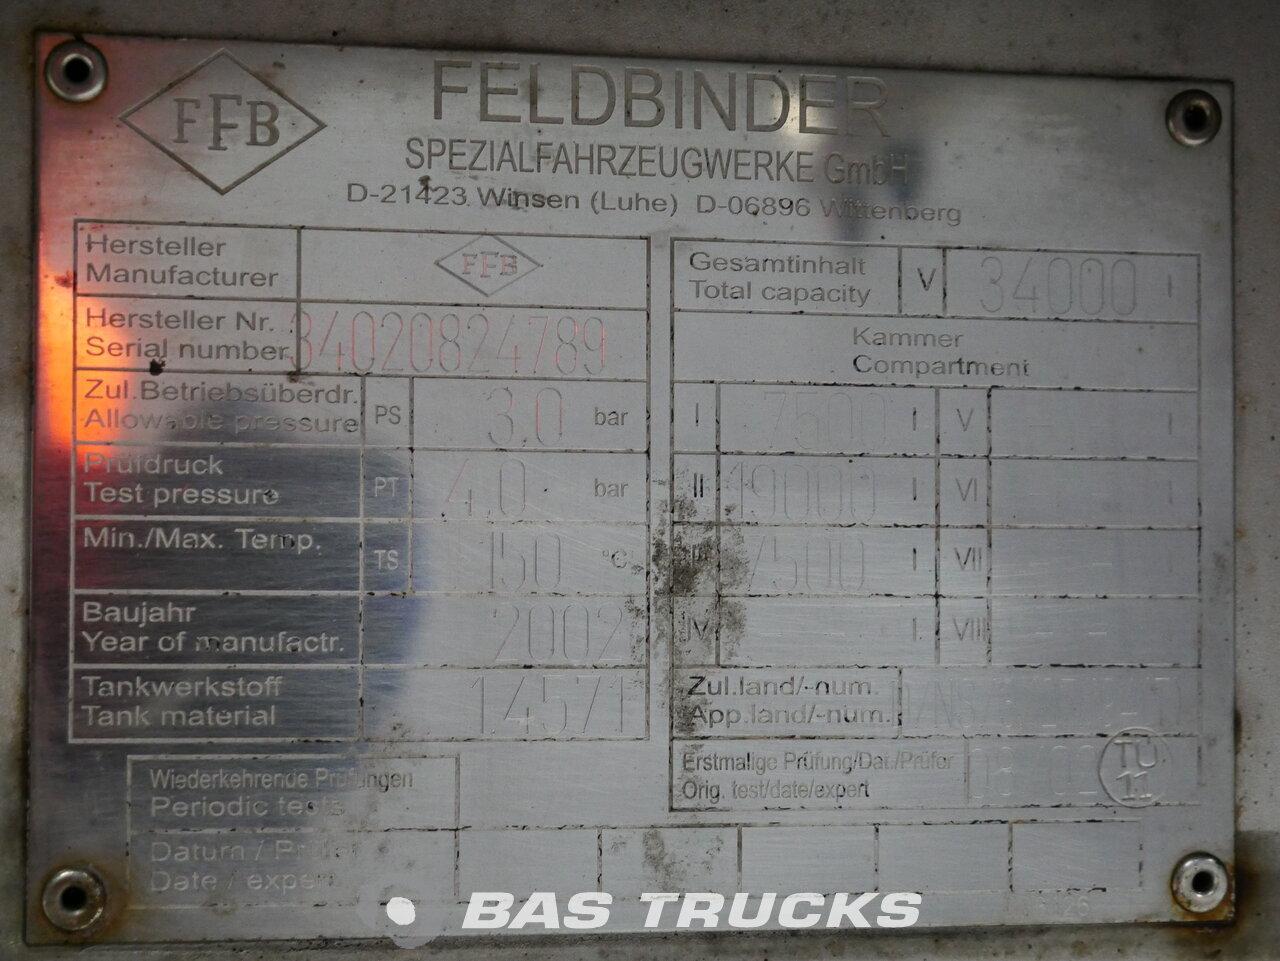 foto de Usado Semirremolque Feldbinder TSA34.3 Heizung 34.000 Ltr / 3 / Ejes 2002